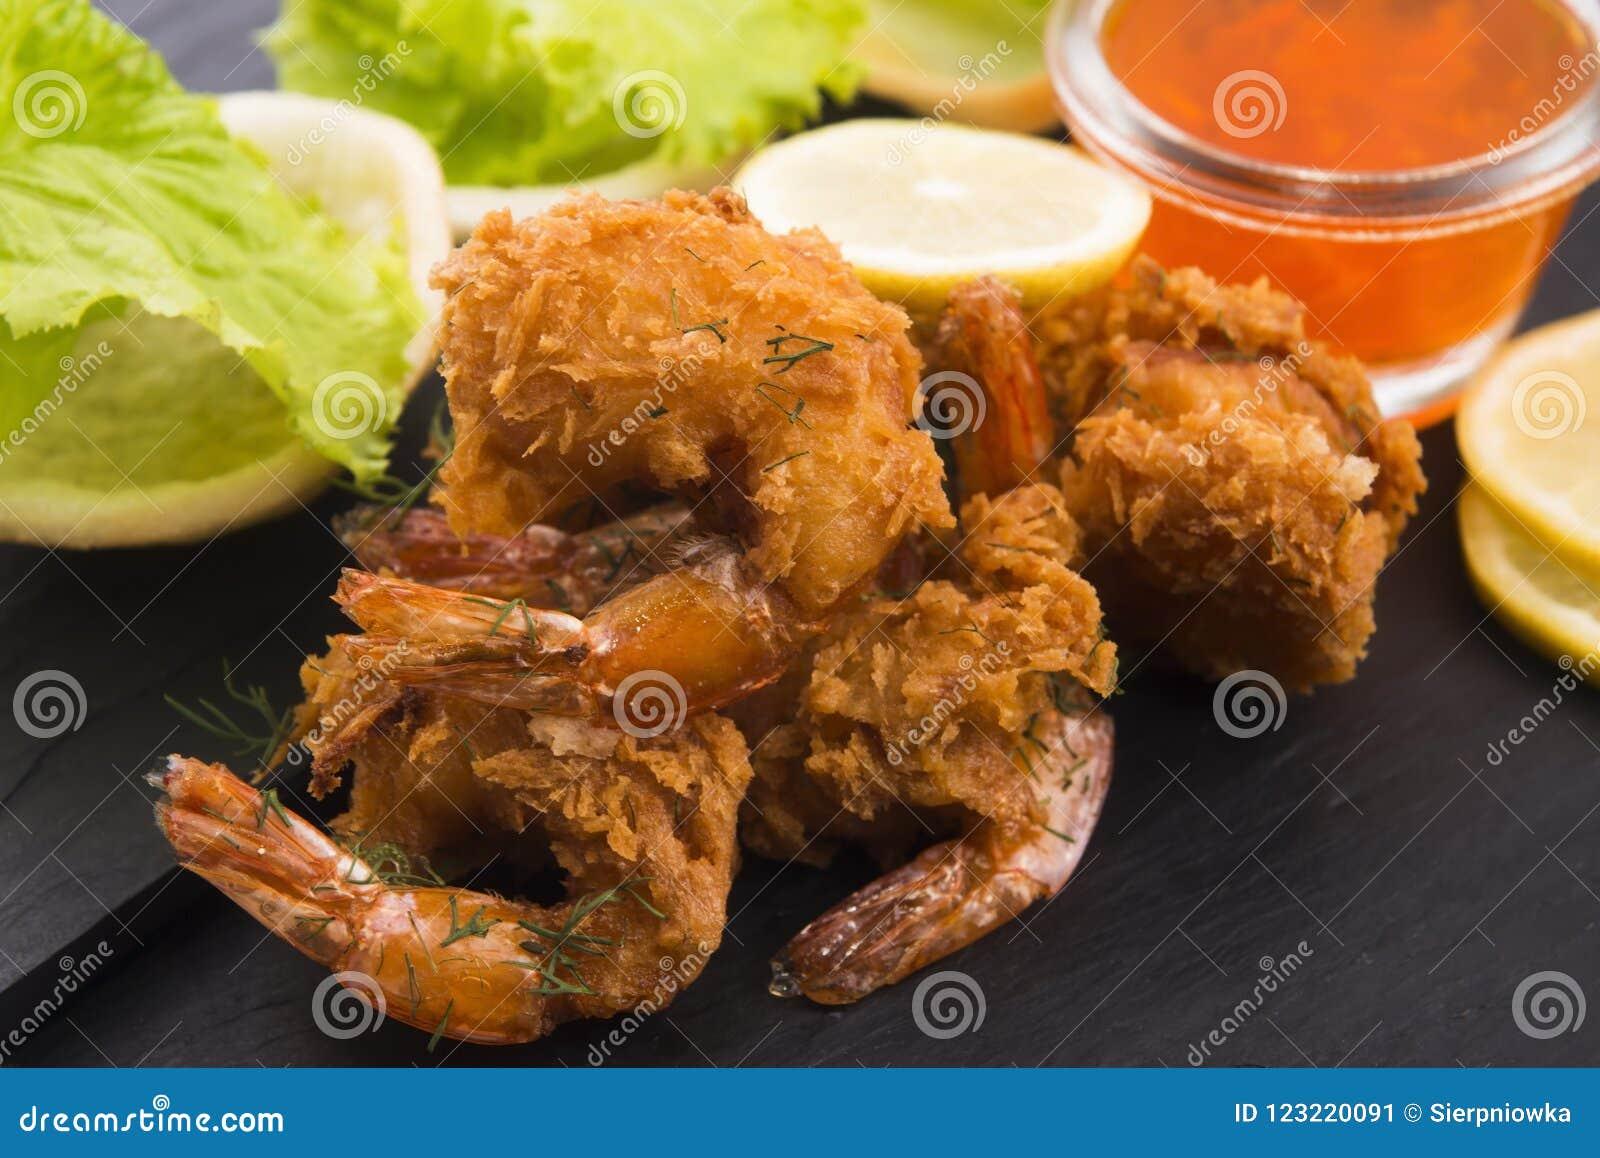 Tiger shrimp fried in Tempura with vegetables